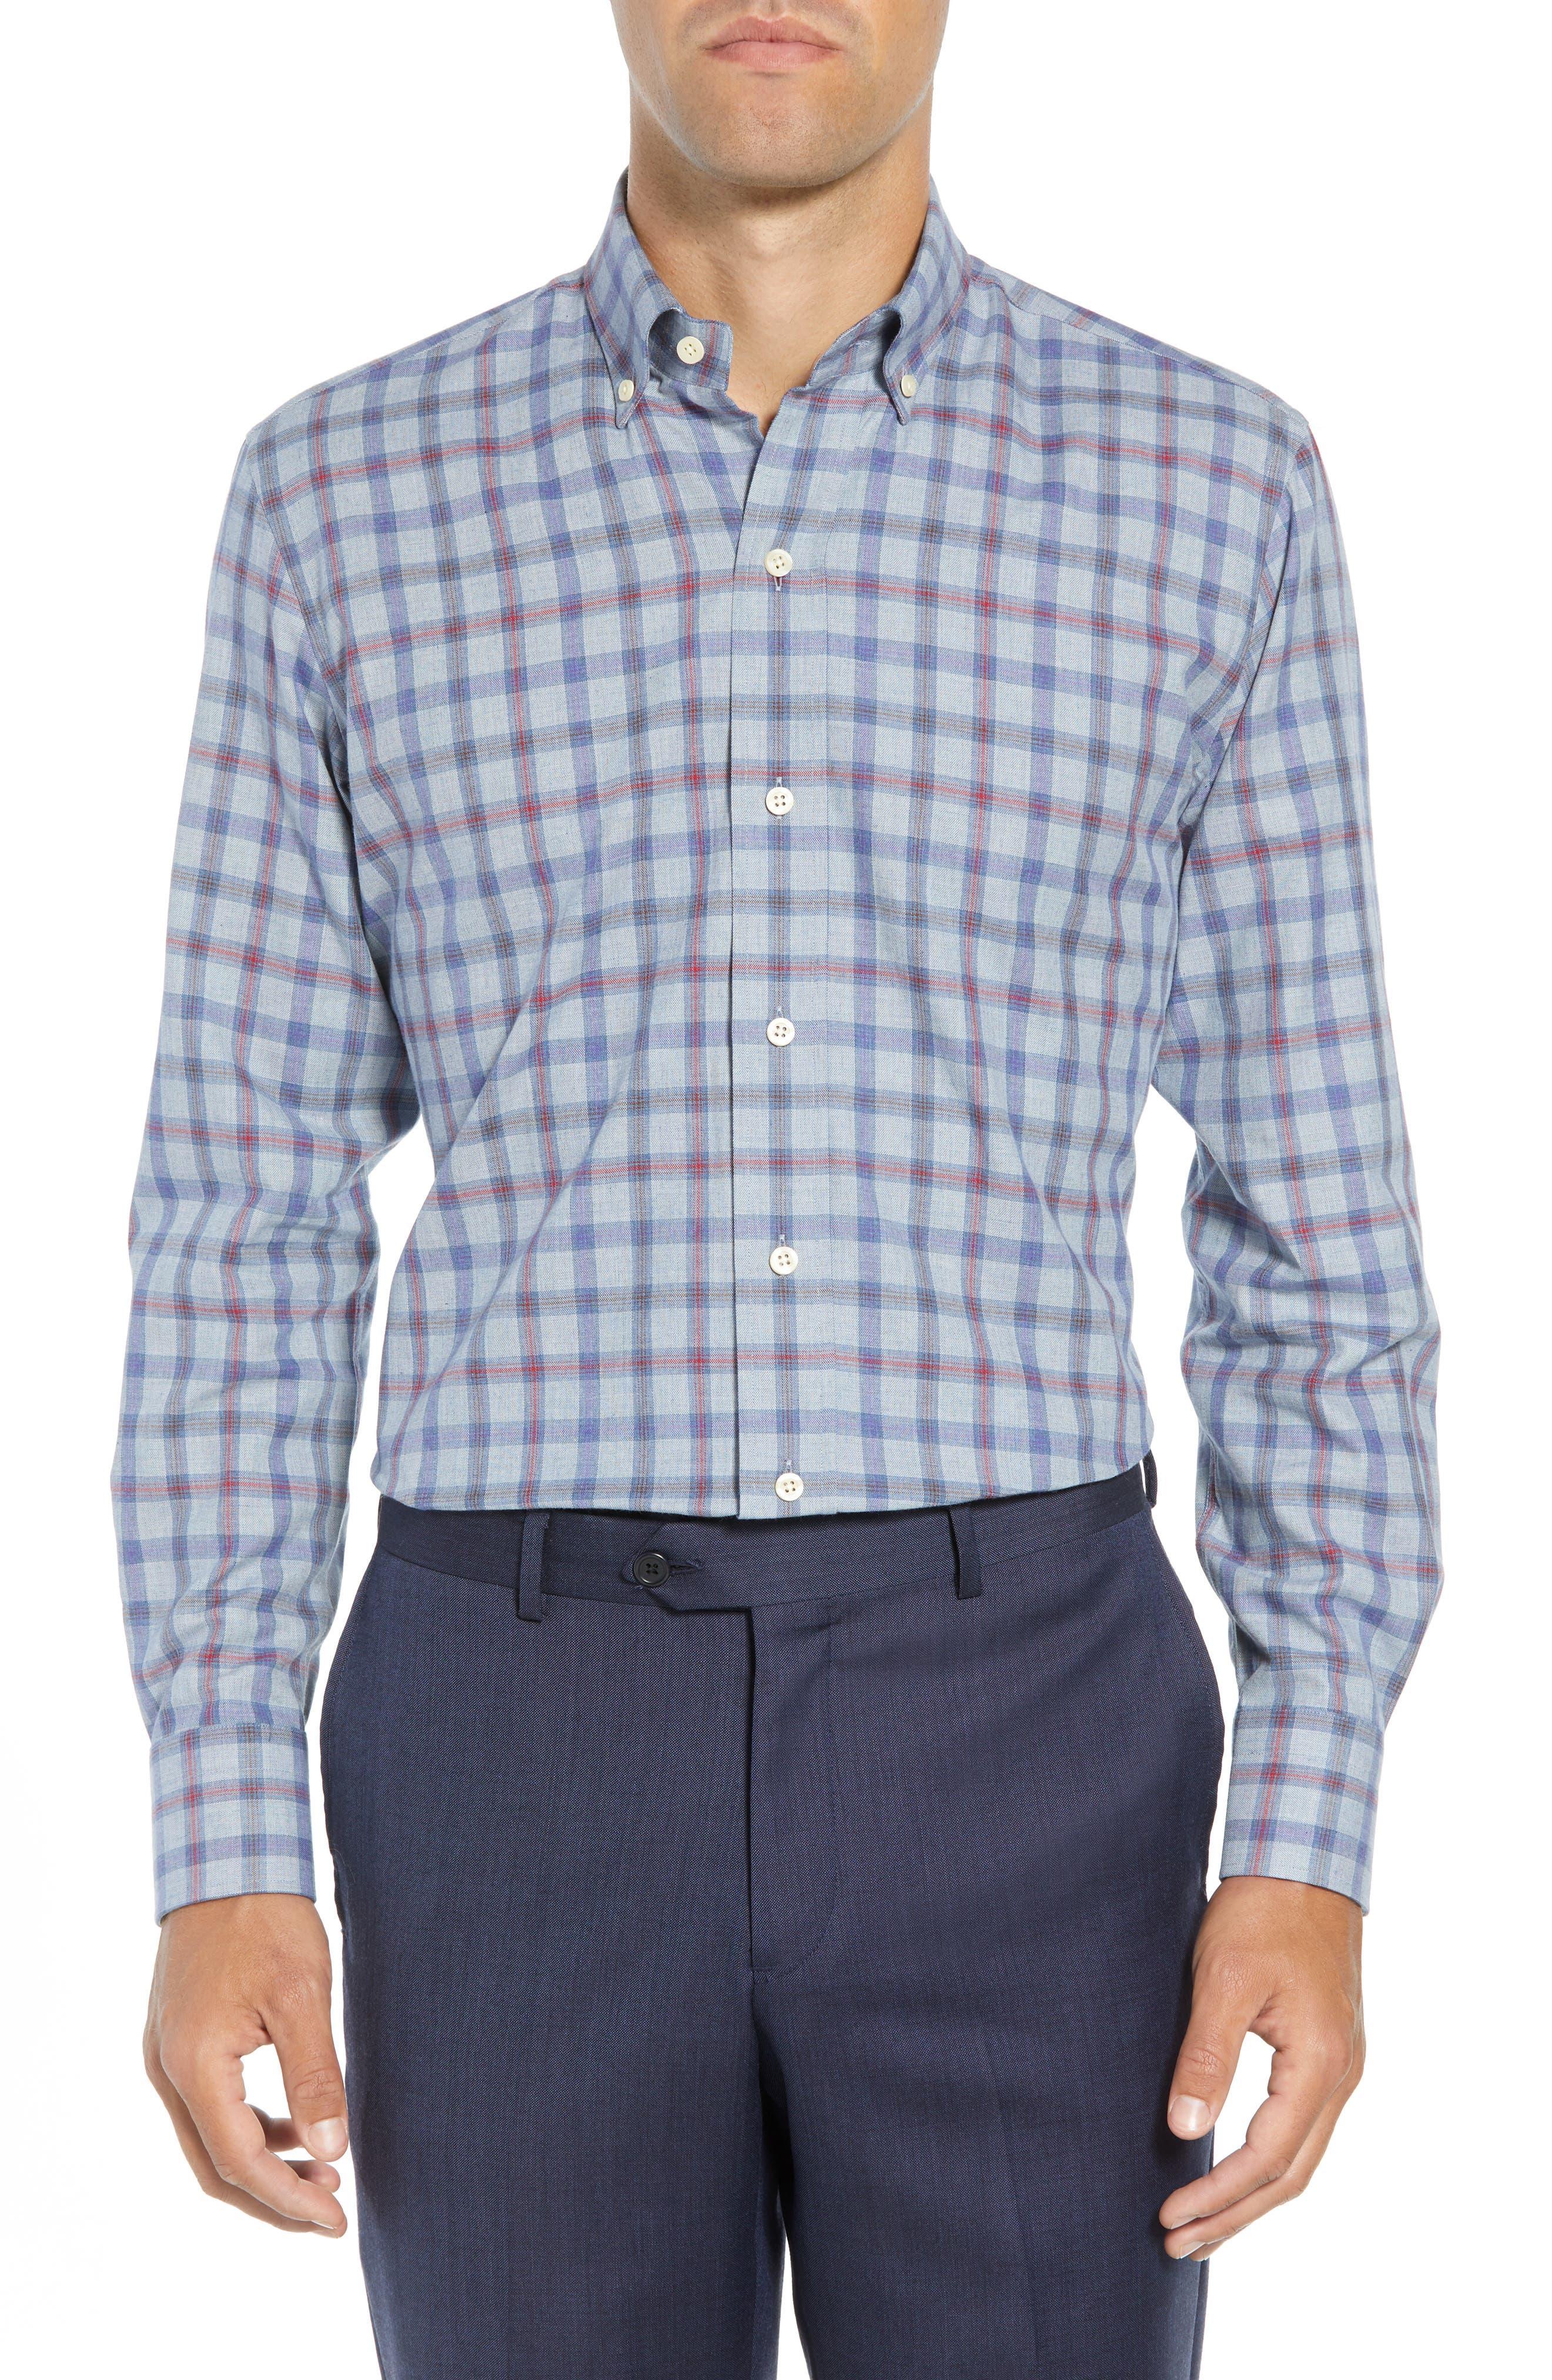 Hilbank Trim Fit Check Dress Shirt,                             Main thumbnail 1, color,                             CADET BLUE